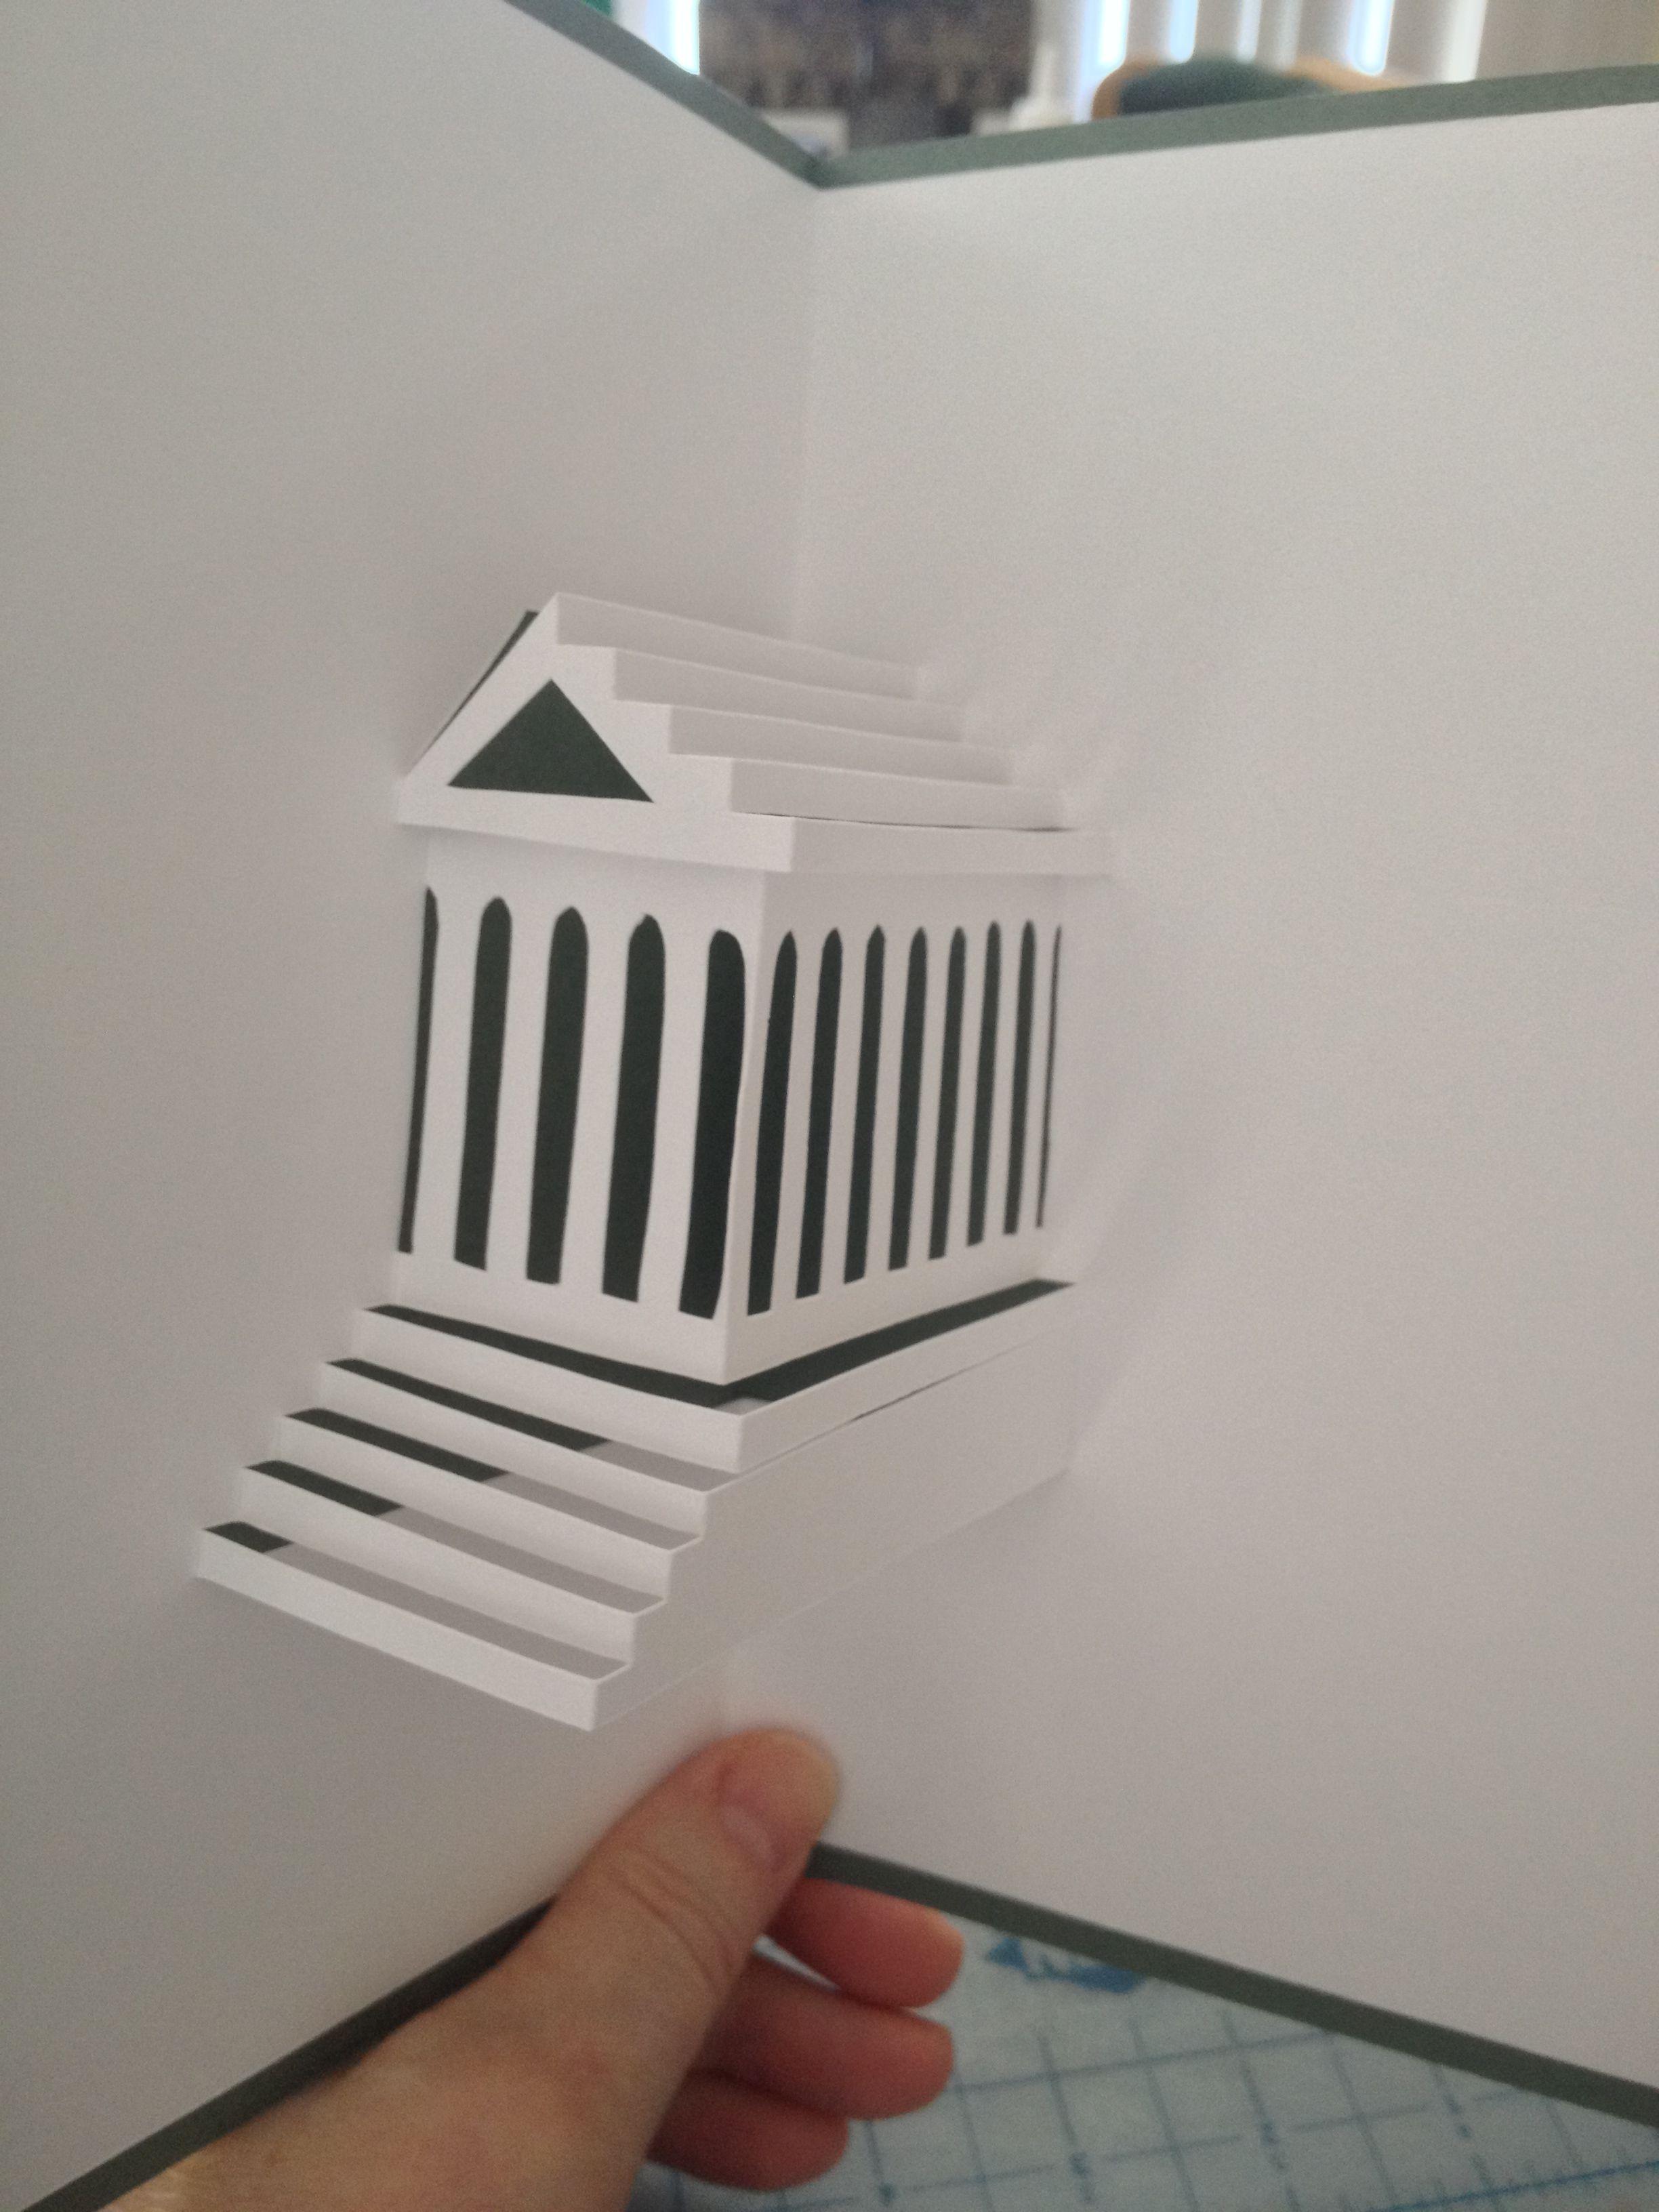 Parthenon Pop Up Card Pop Up Card Templates Diy Pop Up Cards Templates Paper Pop